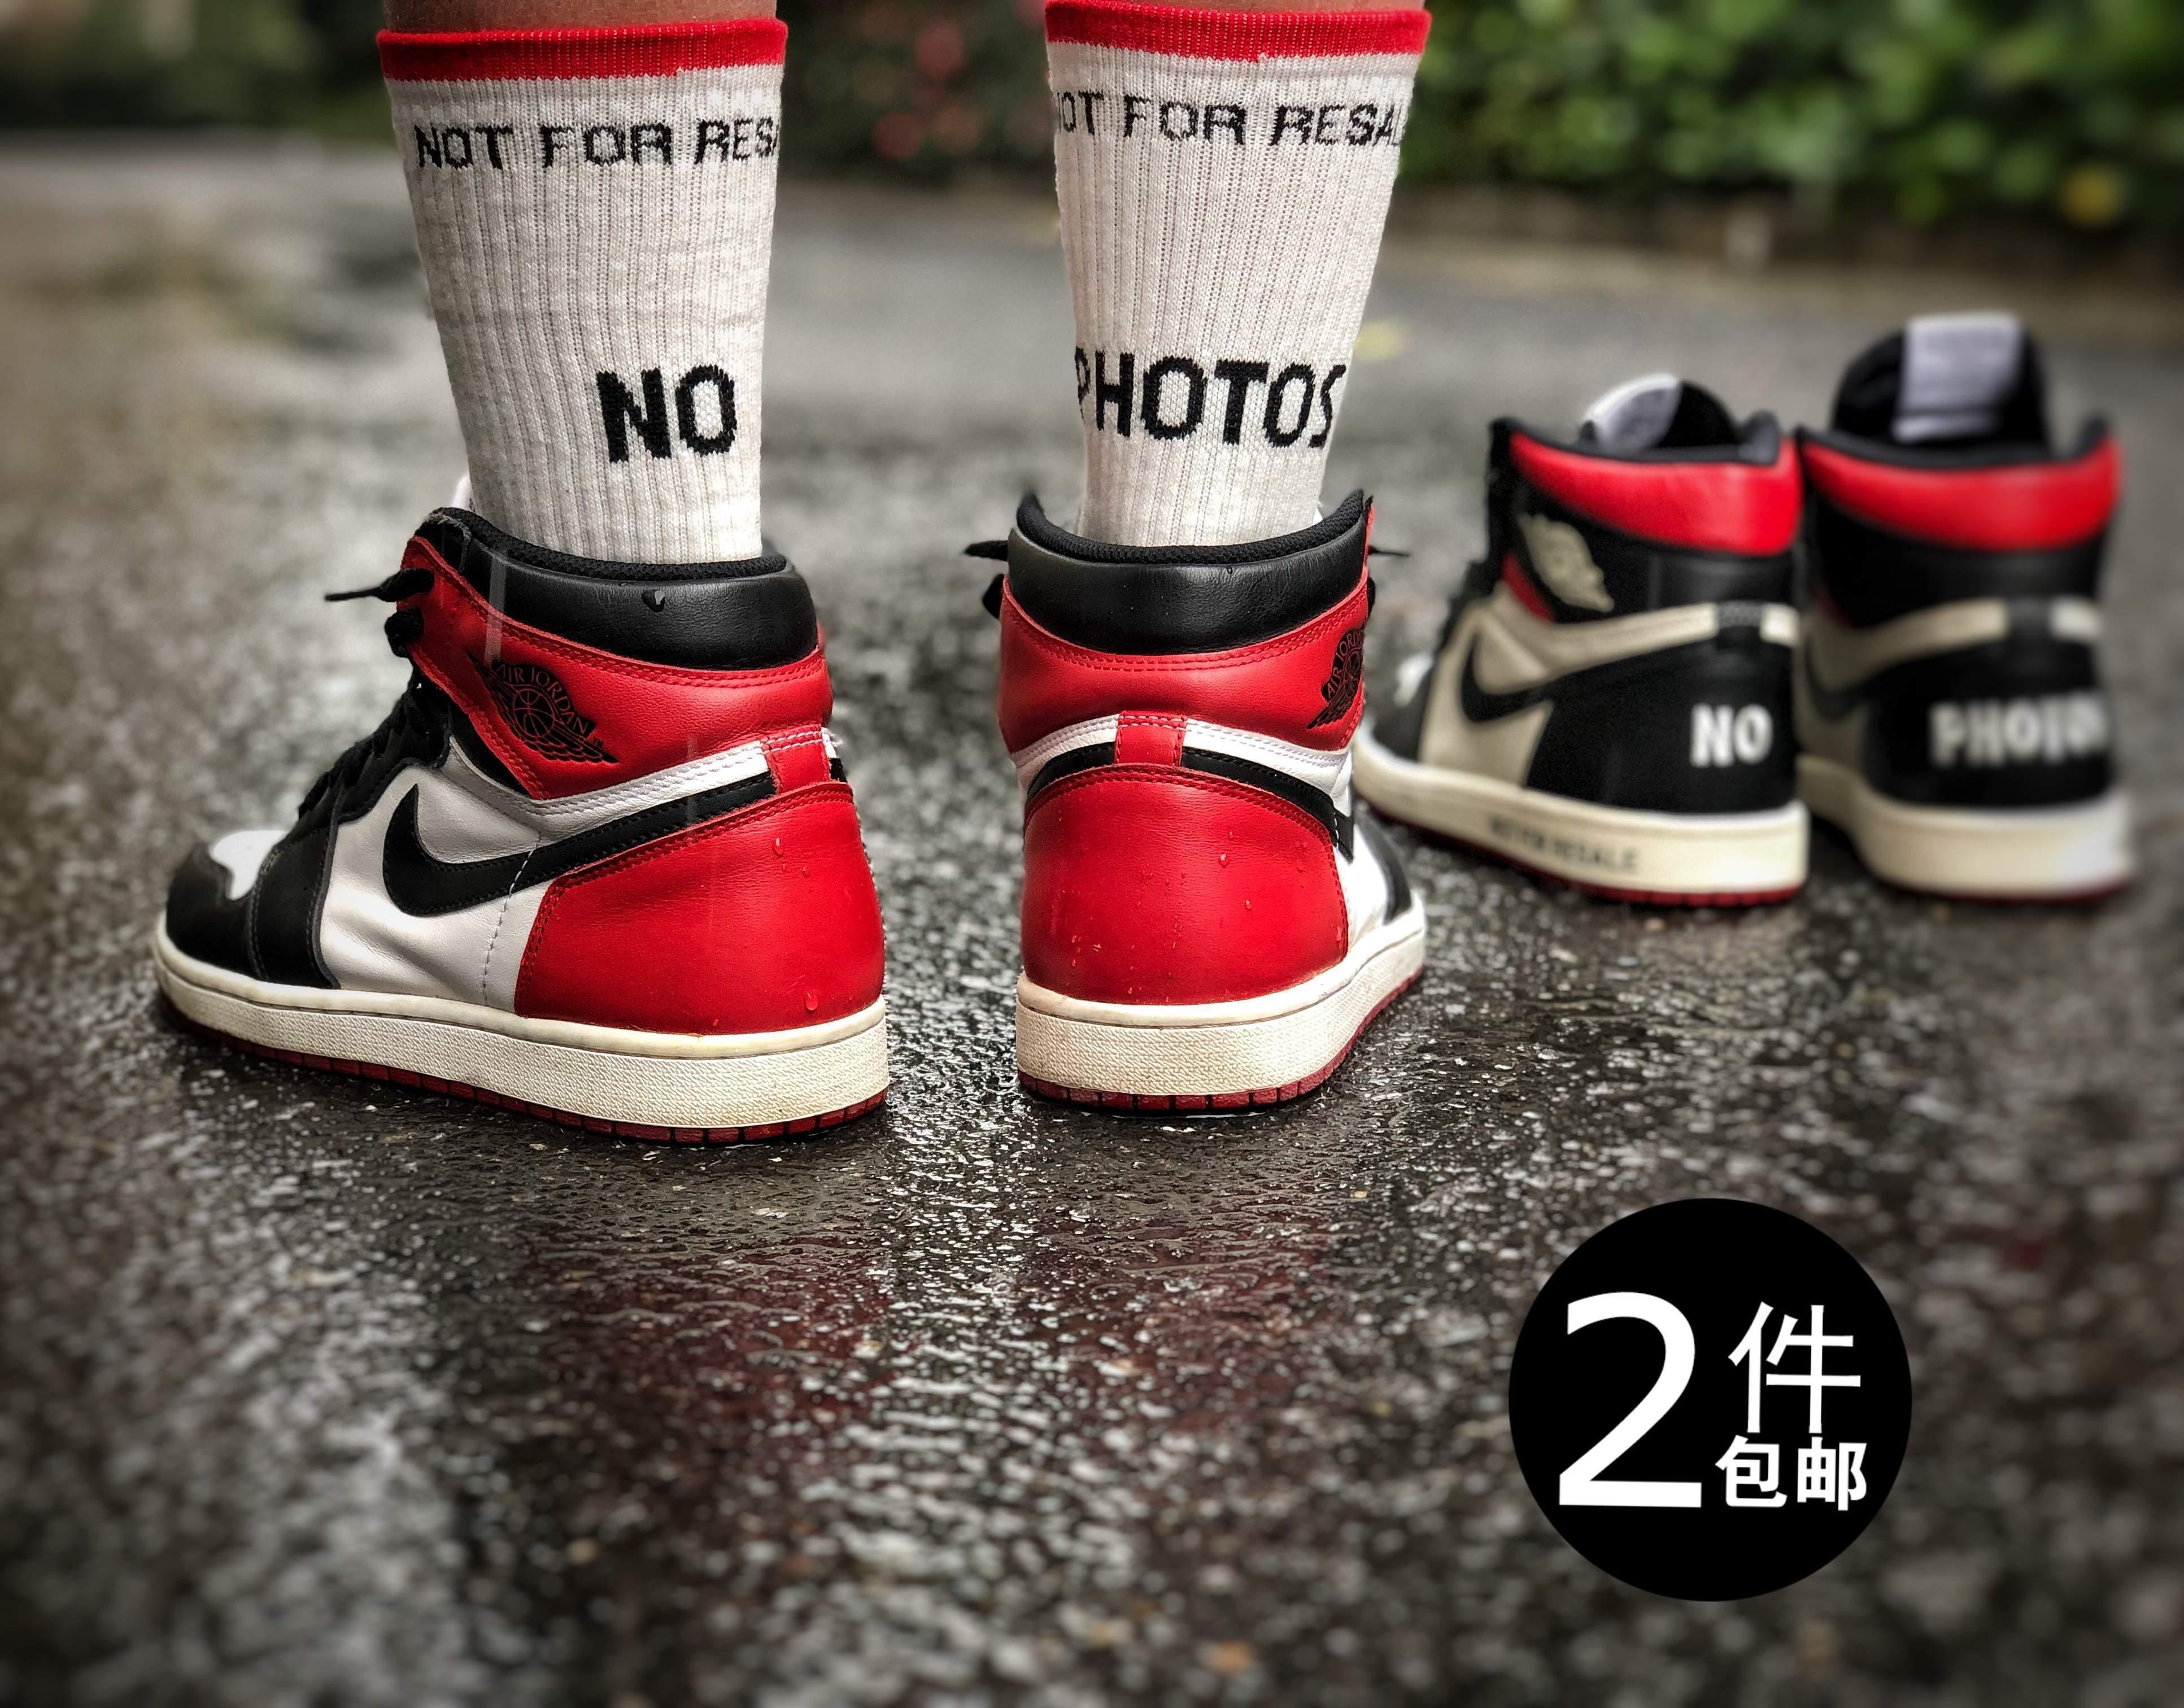 US8球鞋定制AJ1黑红北卡OW黑脚趾黑紫芝加哥禁止转卖扣碎高筒袜子